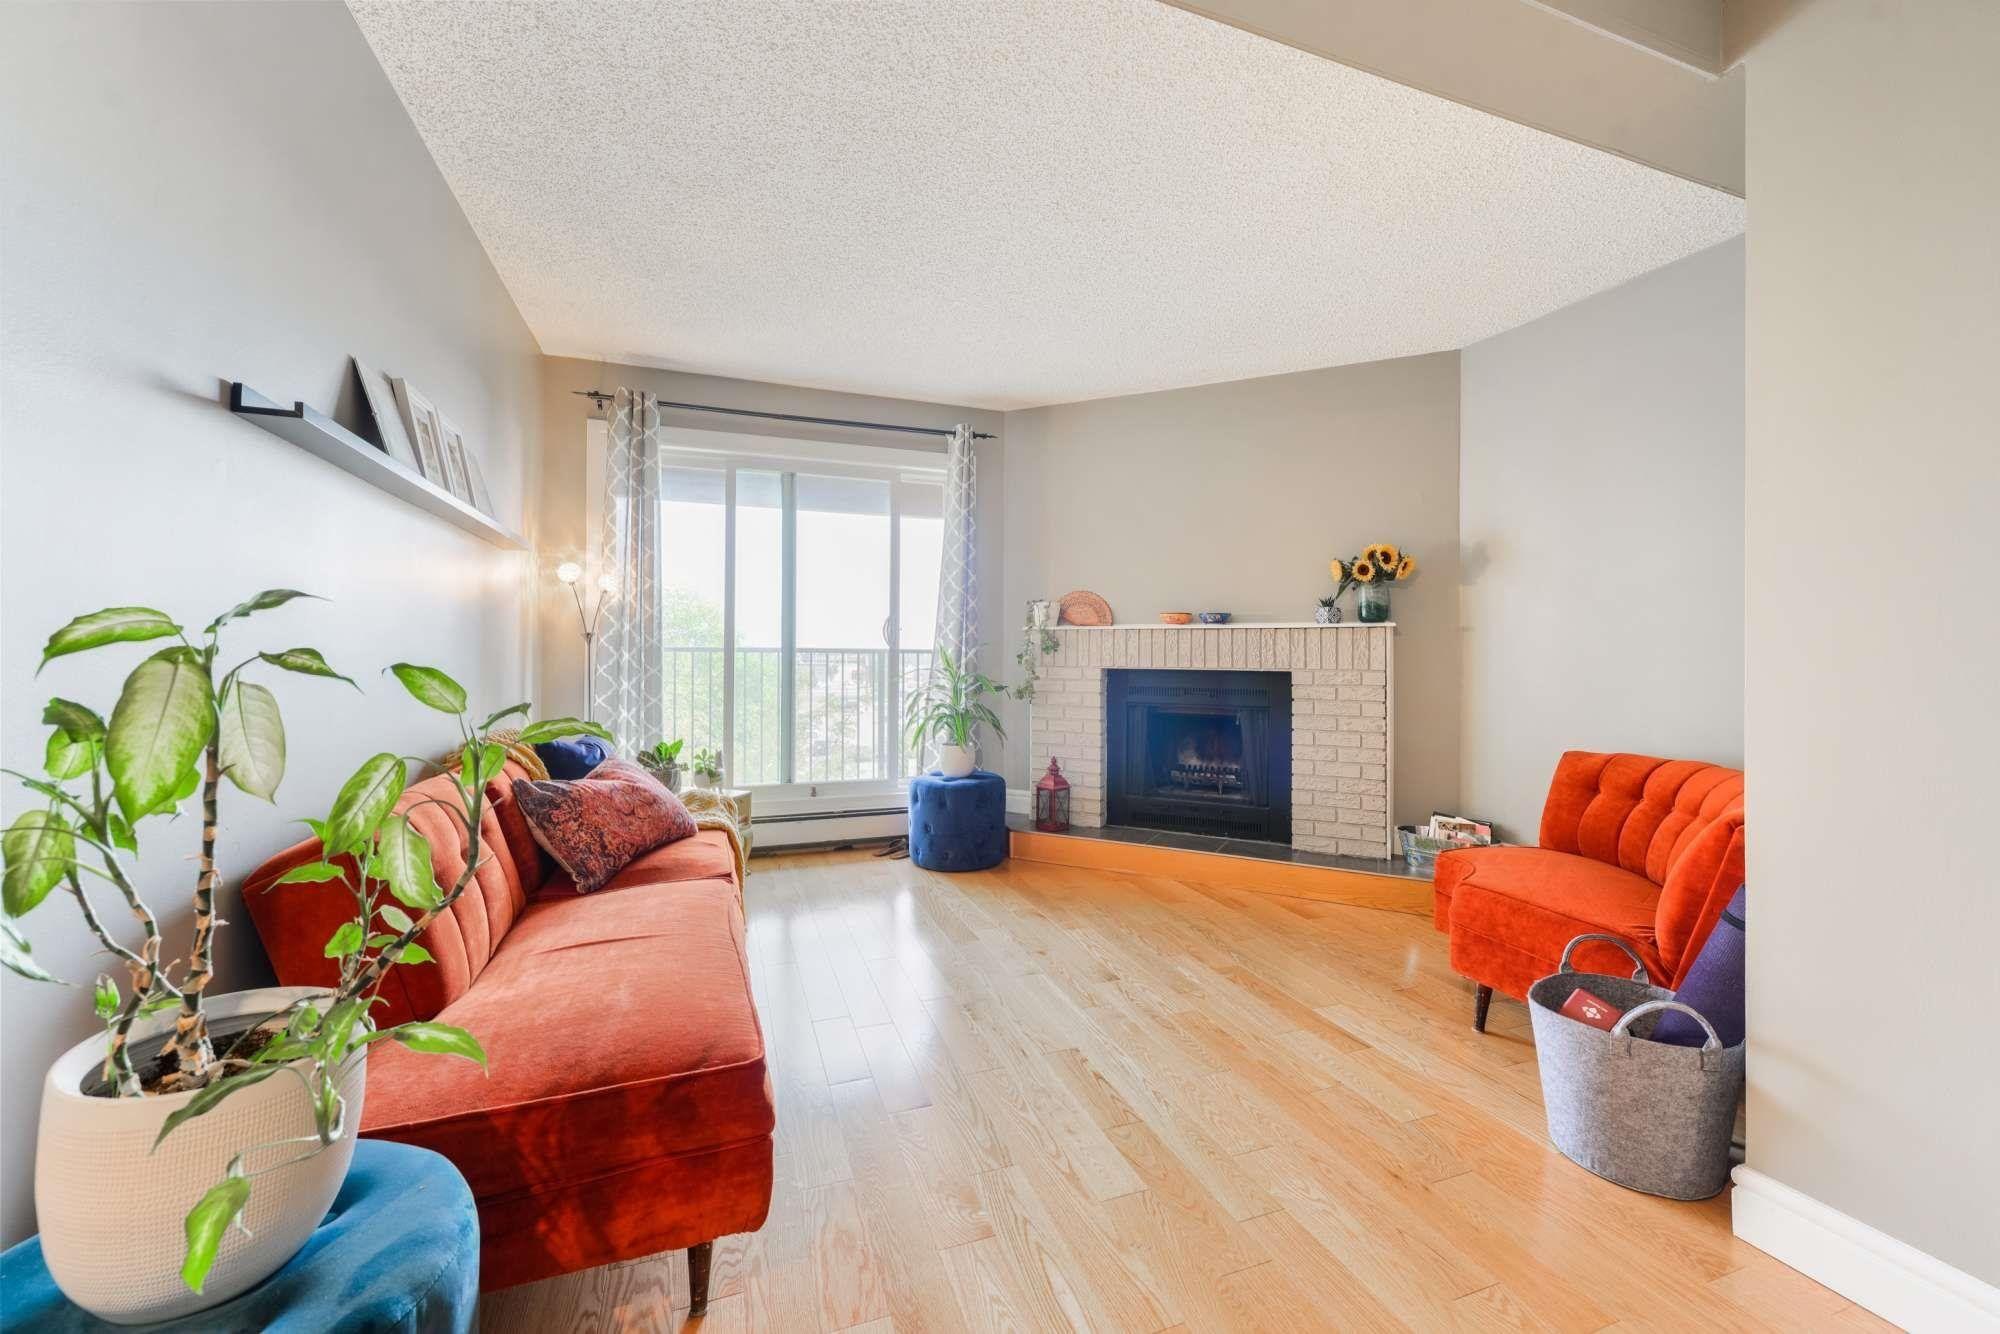 Main Photo: 4041 TUDOR Glen: St. Albert Condo for sale : MLS®# E4257399